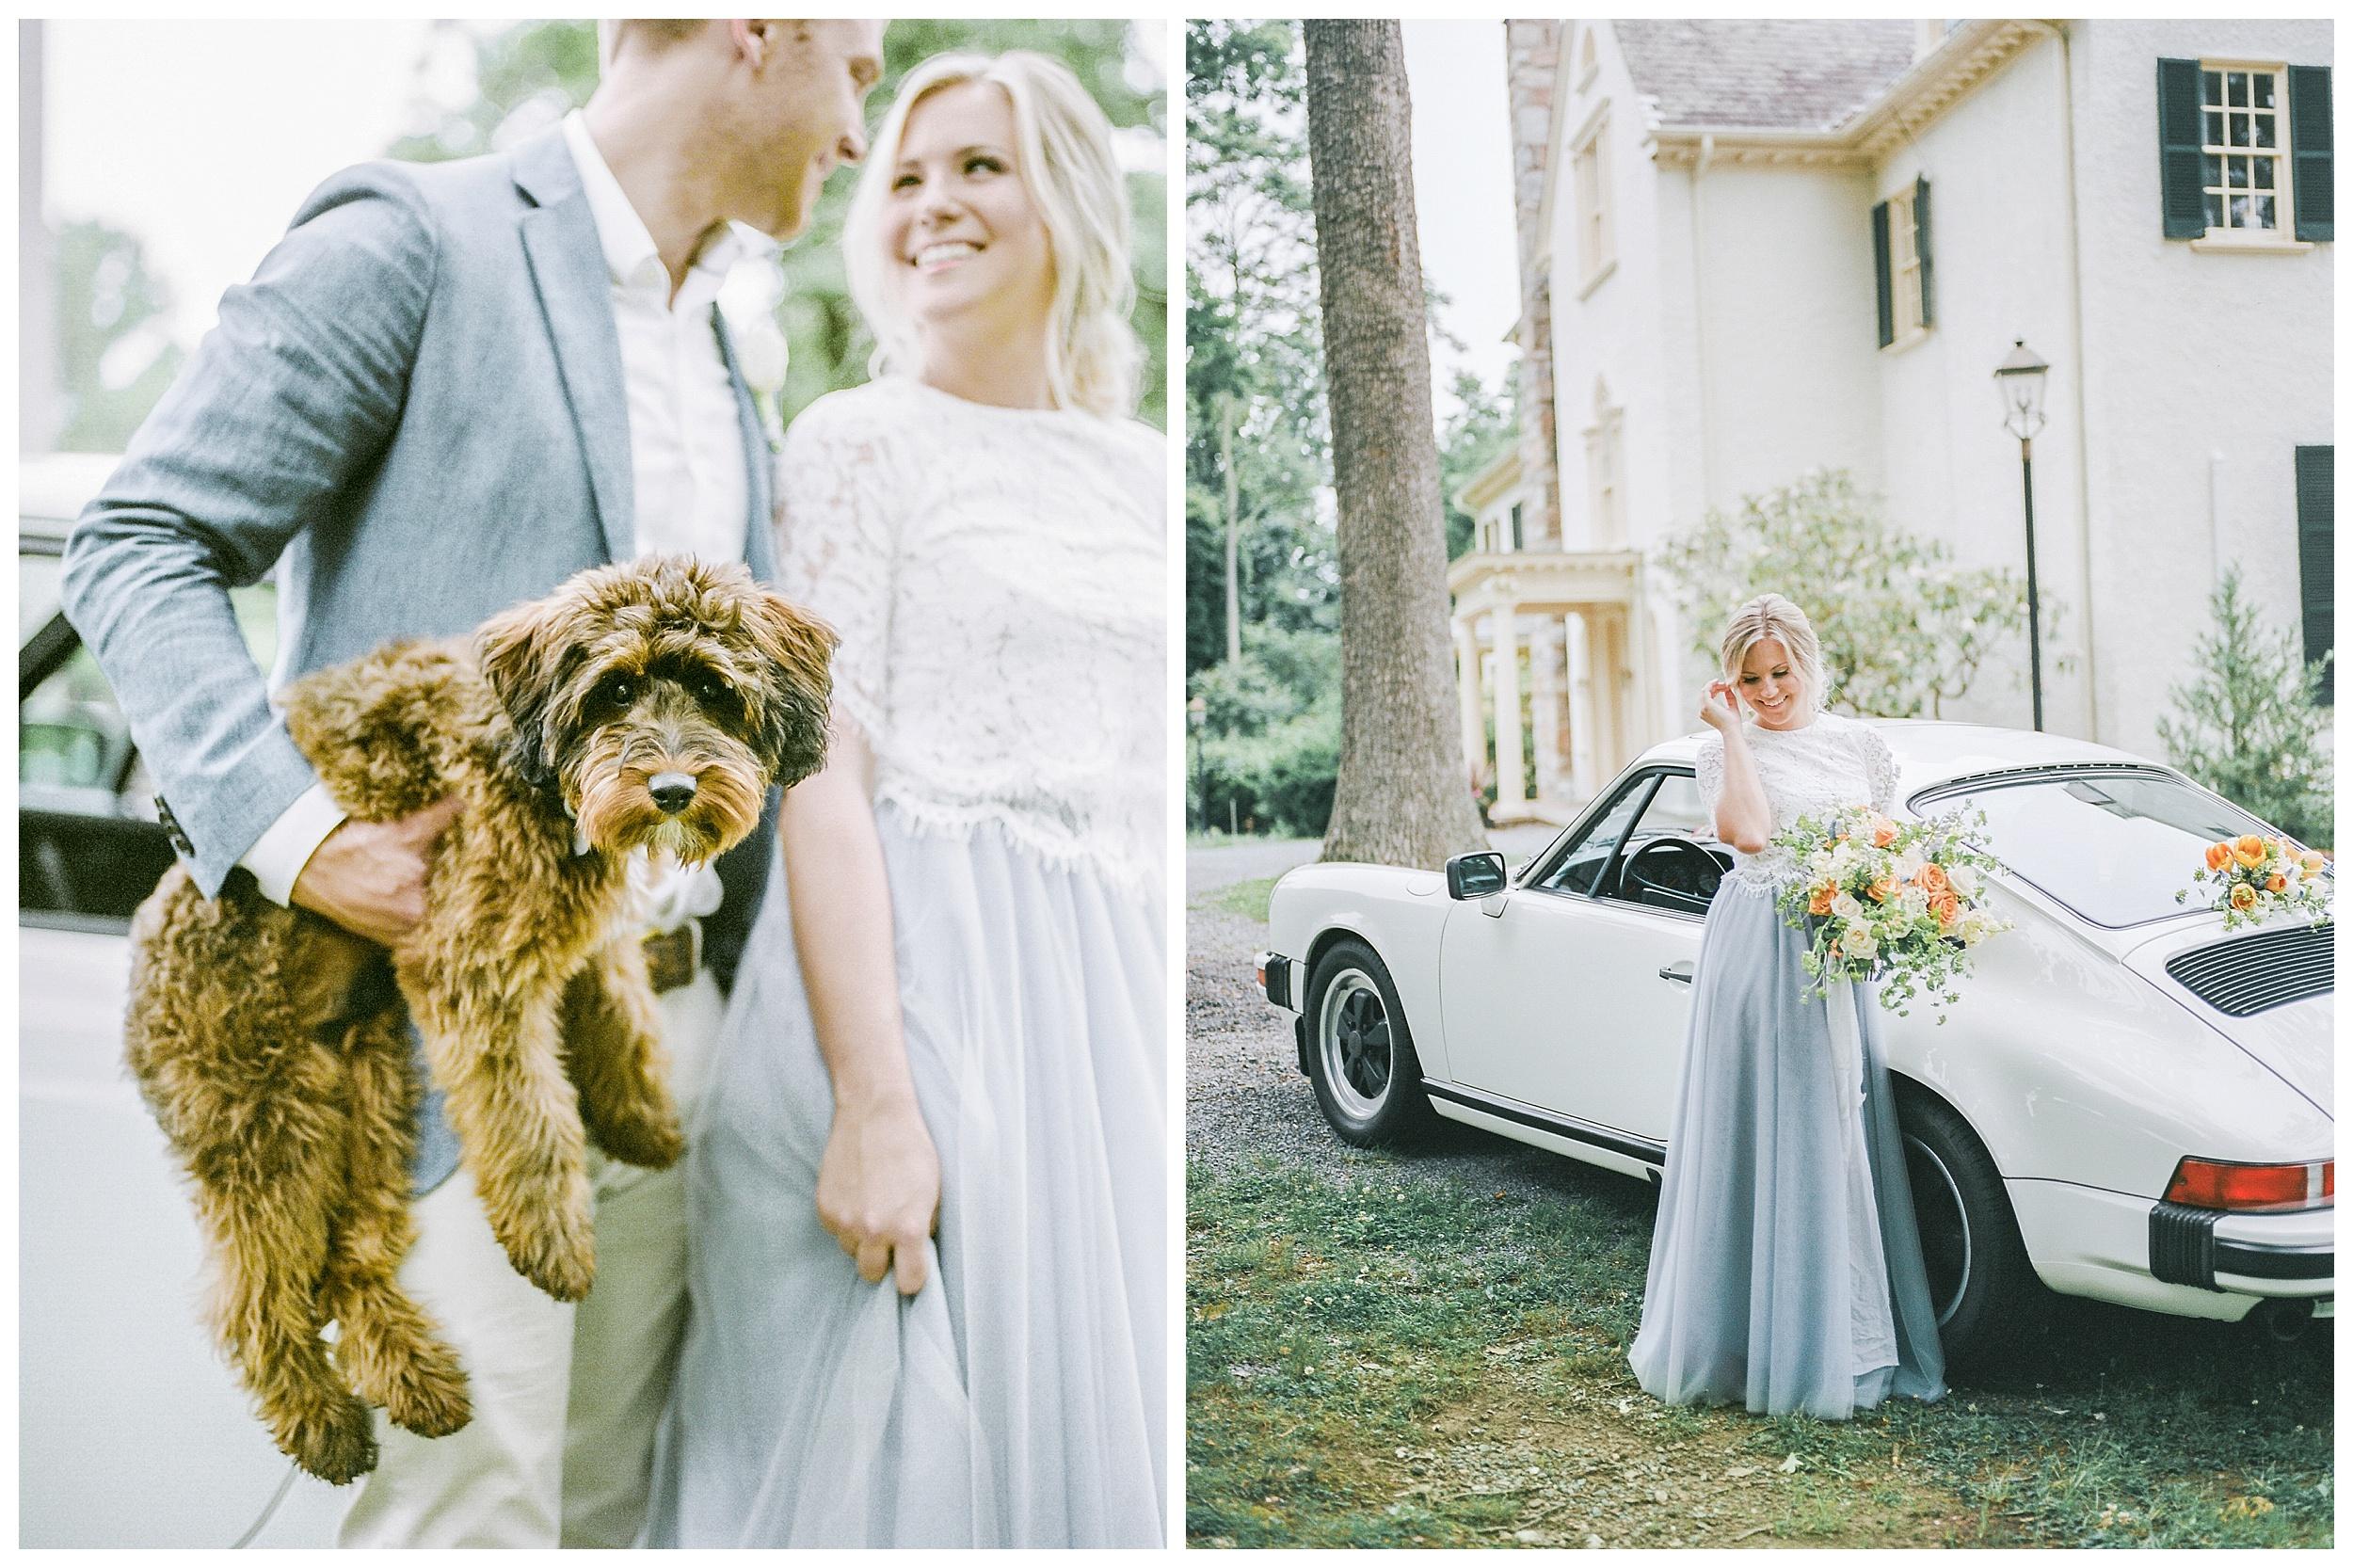 Rust Manor Wedding   Virginia Wedding Photographer Kir Tuben_0053.jpg